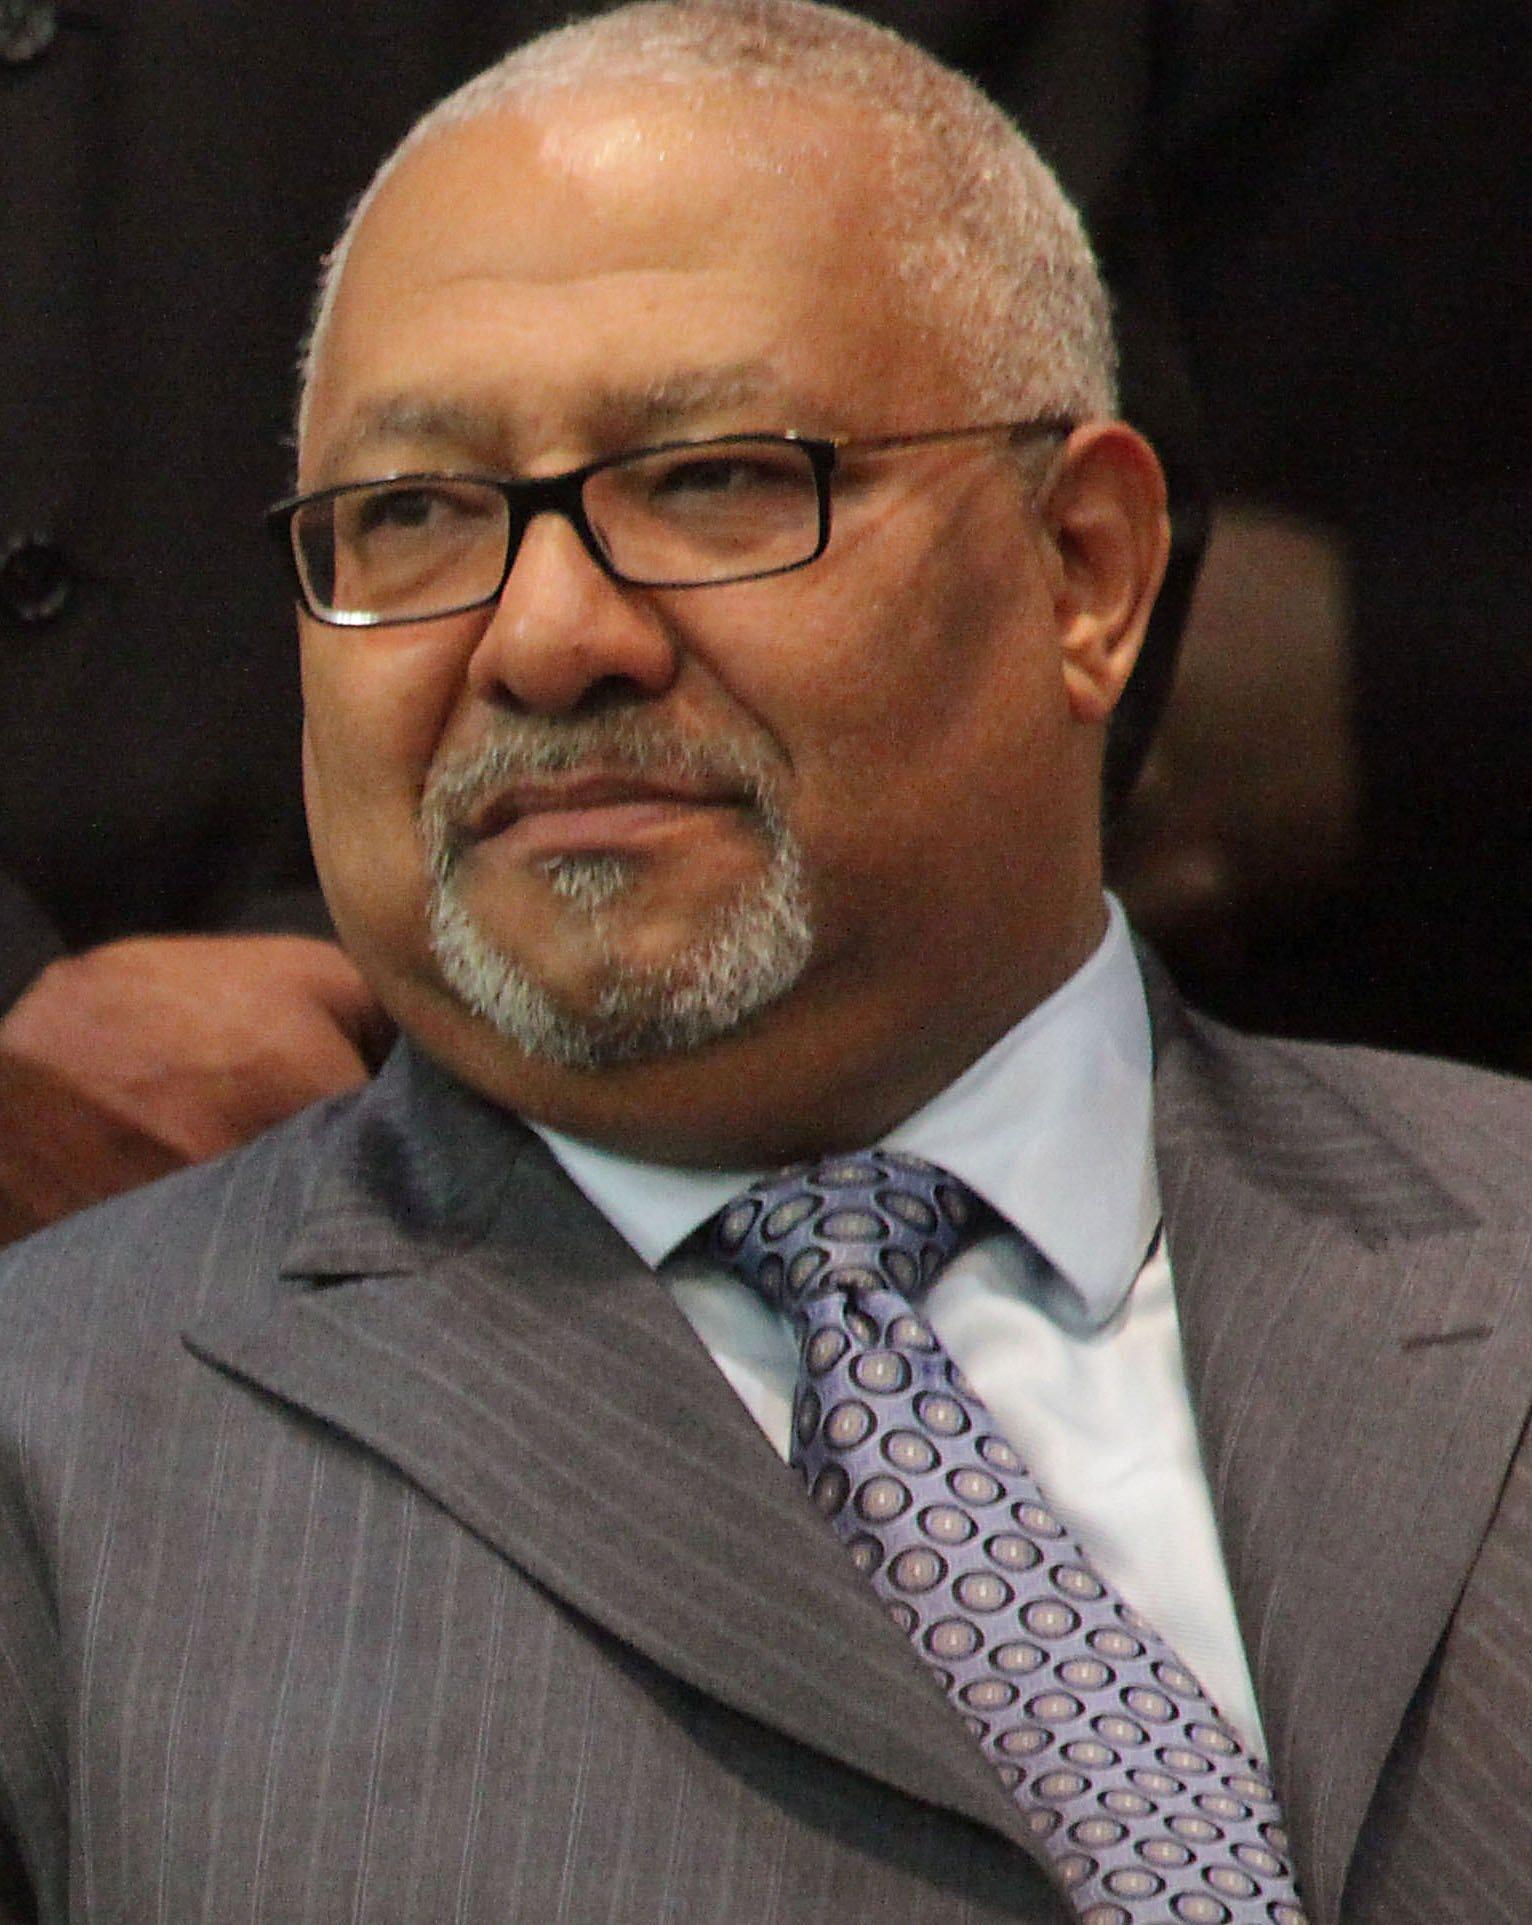 Rev. Horace Sheffield on May, 16, 2013.